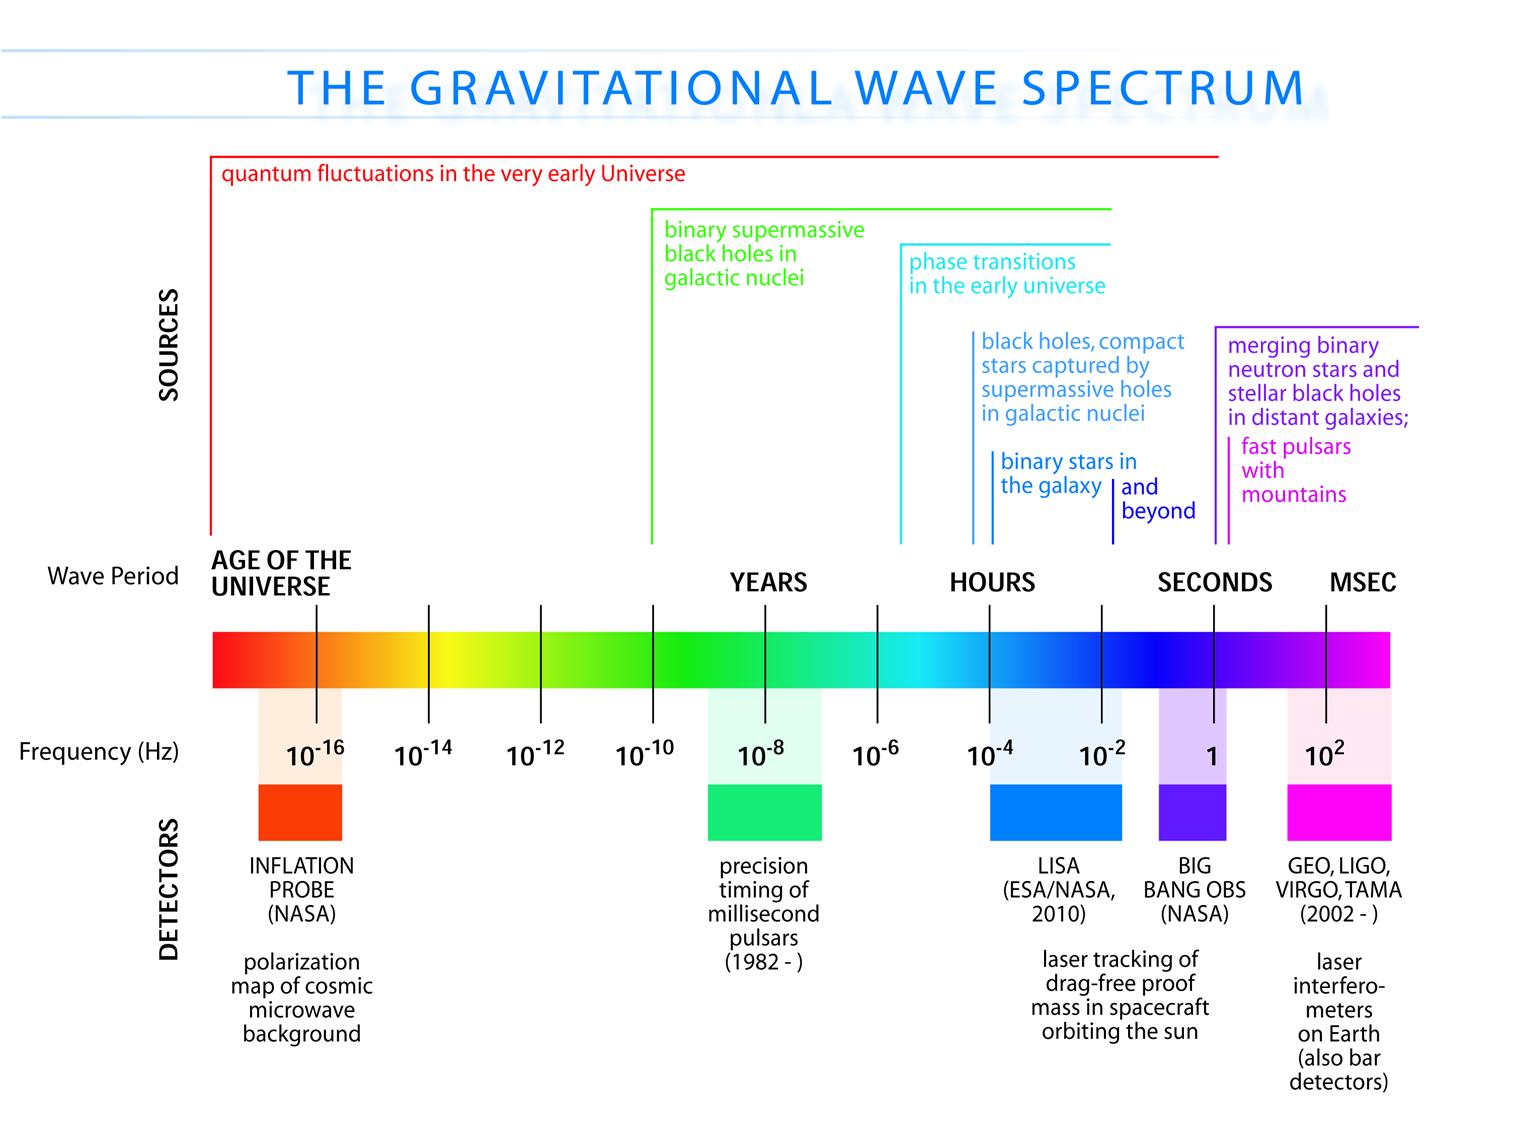 The Wider Gravitational Wave Spectrum